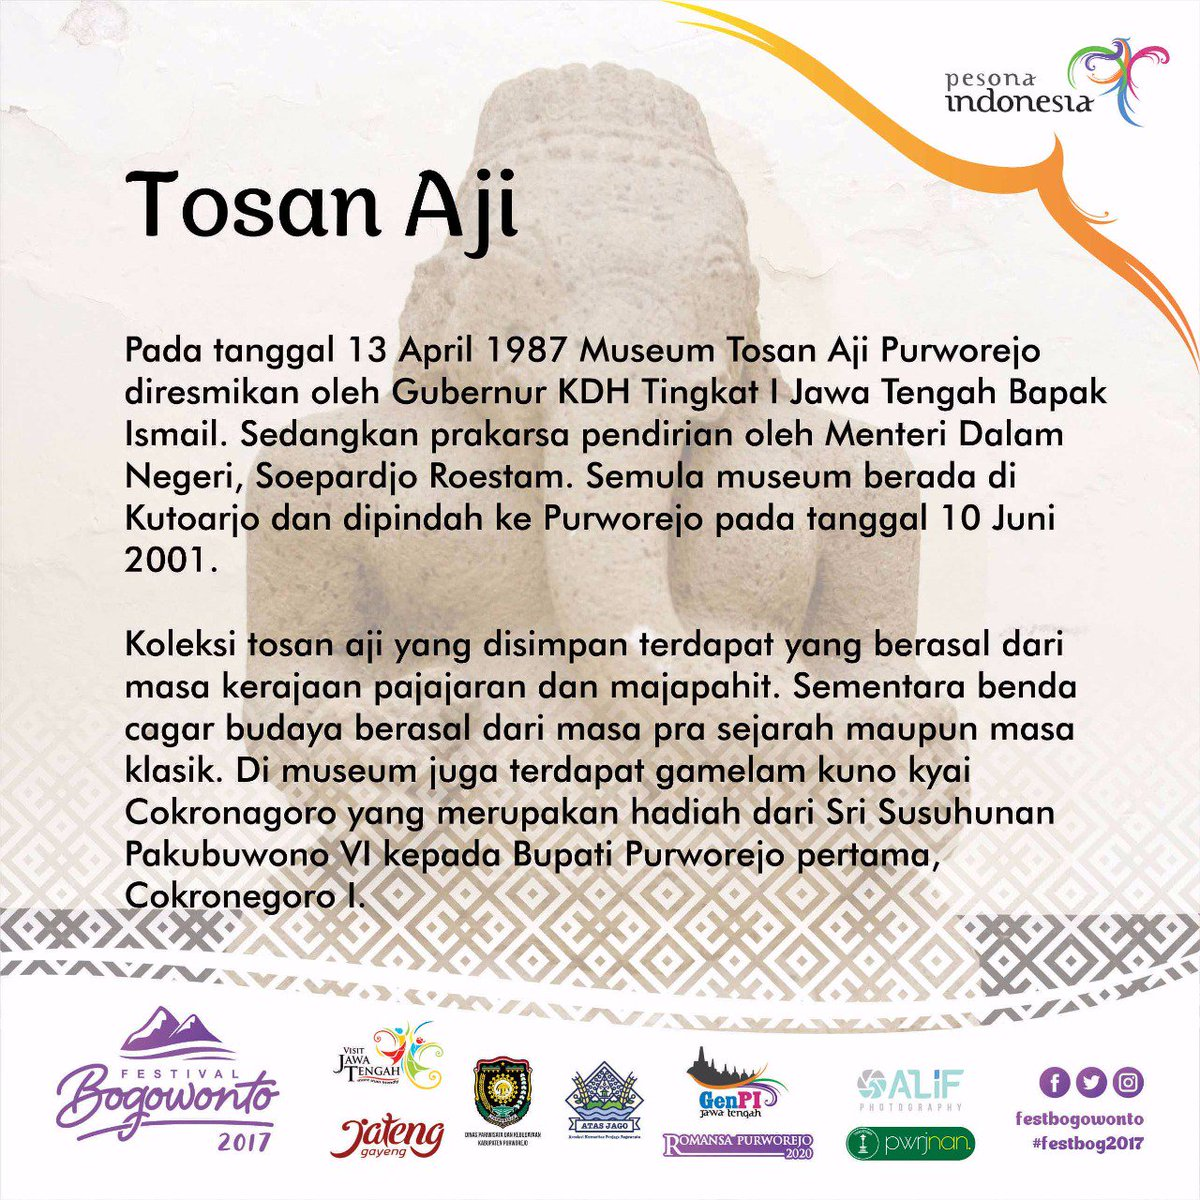 Festivalbogowonto Twitter Museum Tosan Aji Menarik Wajib Dikunjungi Ya Festivalbogowonto2017